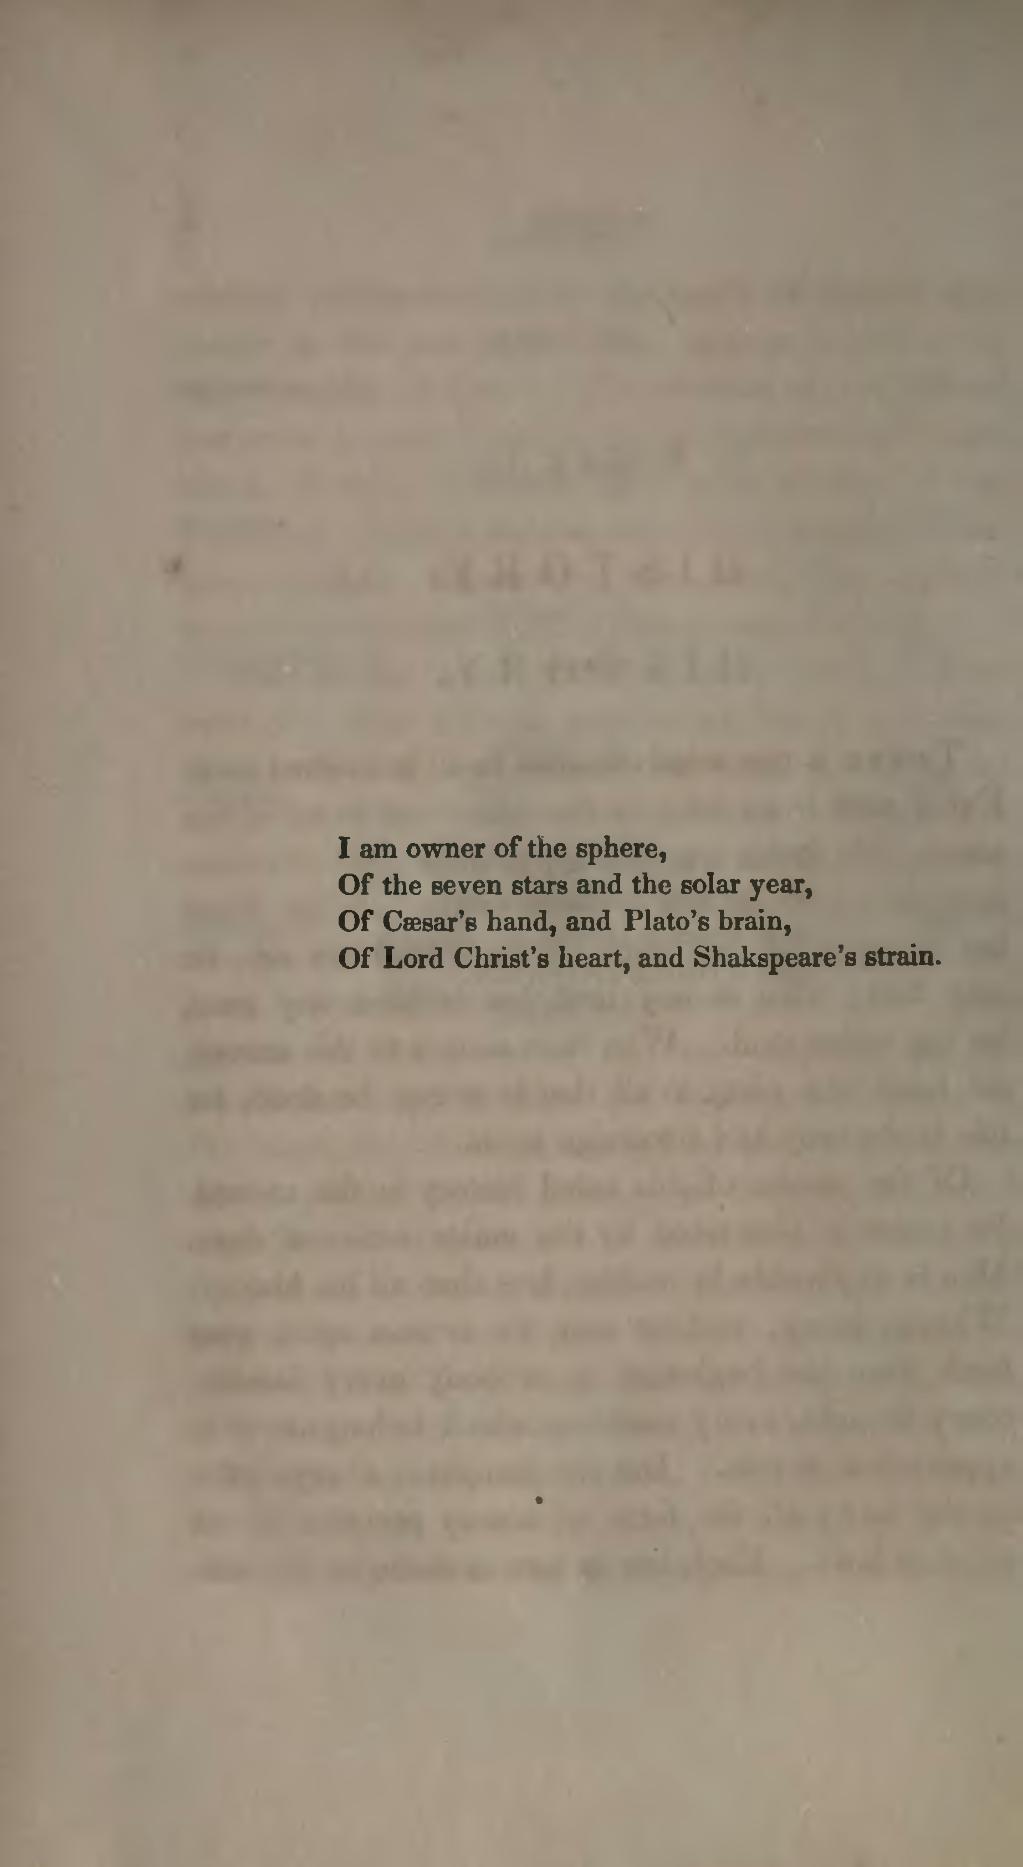 023 Essays First Series Page14 1024px Essays2c 28184729 Djvu Essay Stunning Emerson Pdf Shelburne Publisher Full